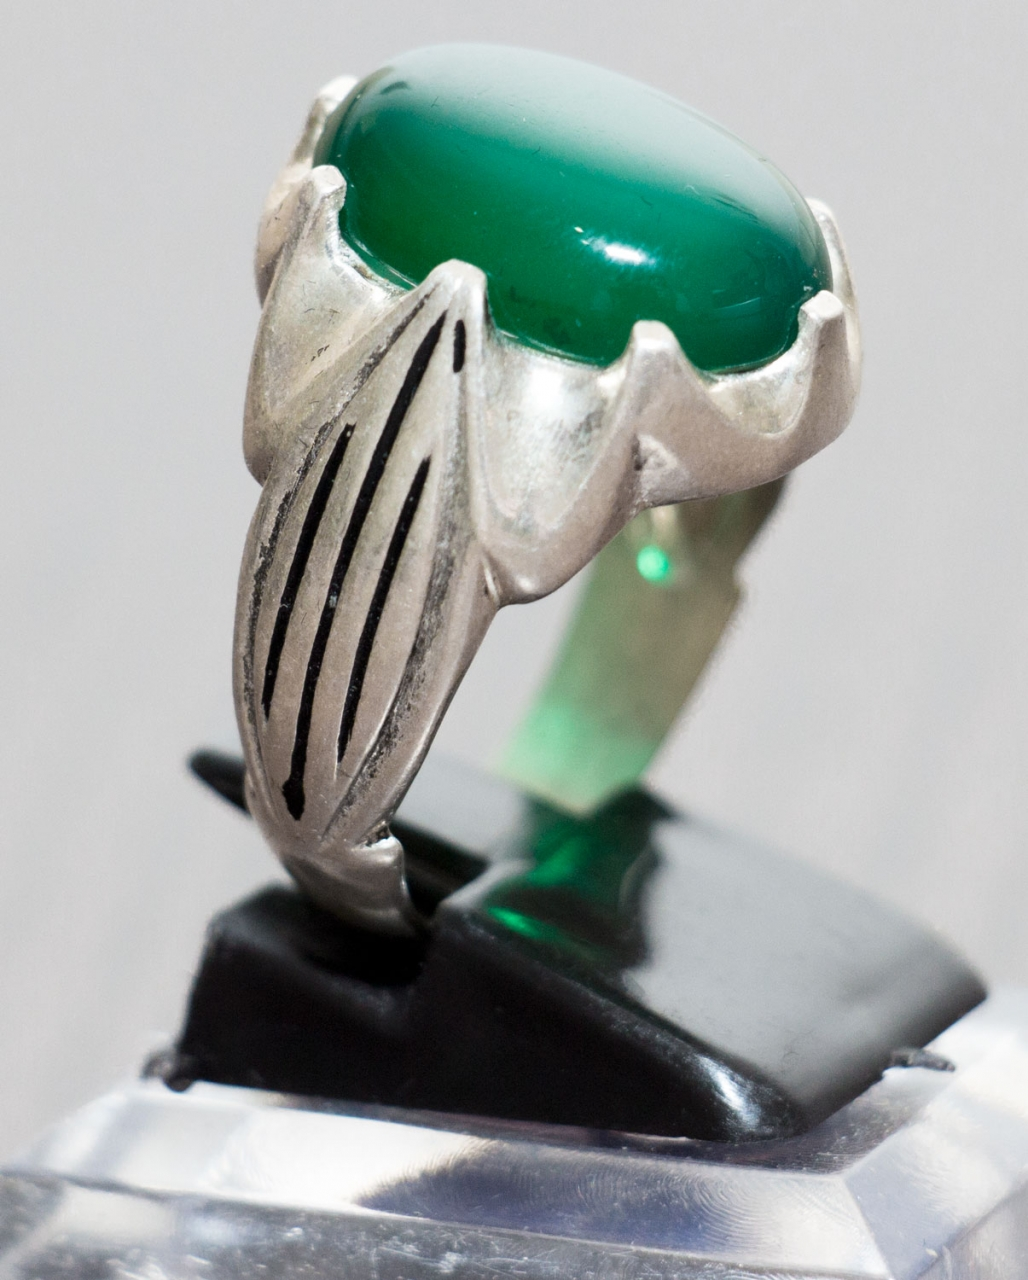 Aqiq Khorasani Grün - ovale Form in Silberfassung